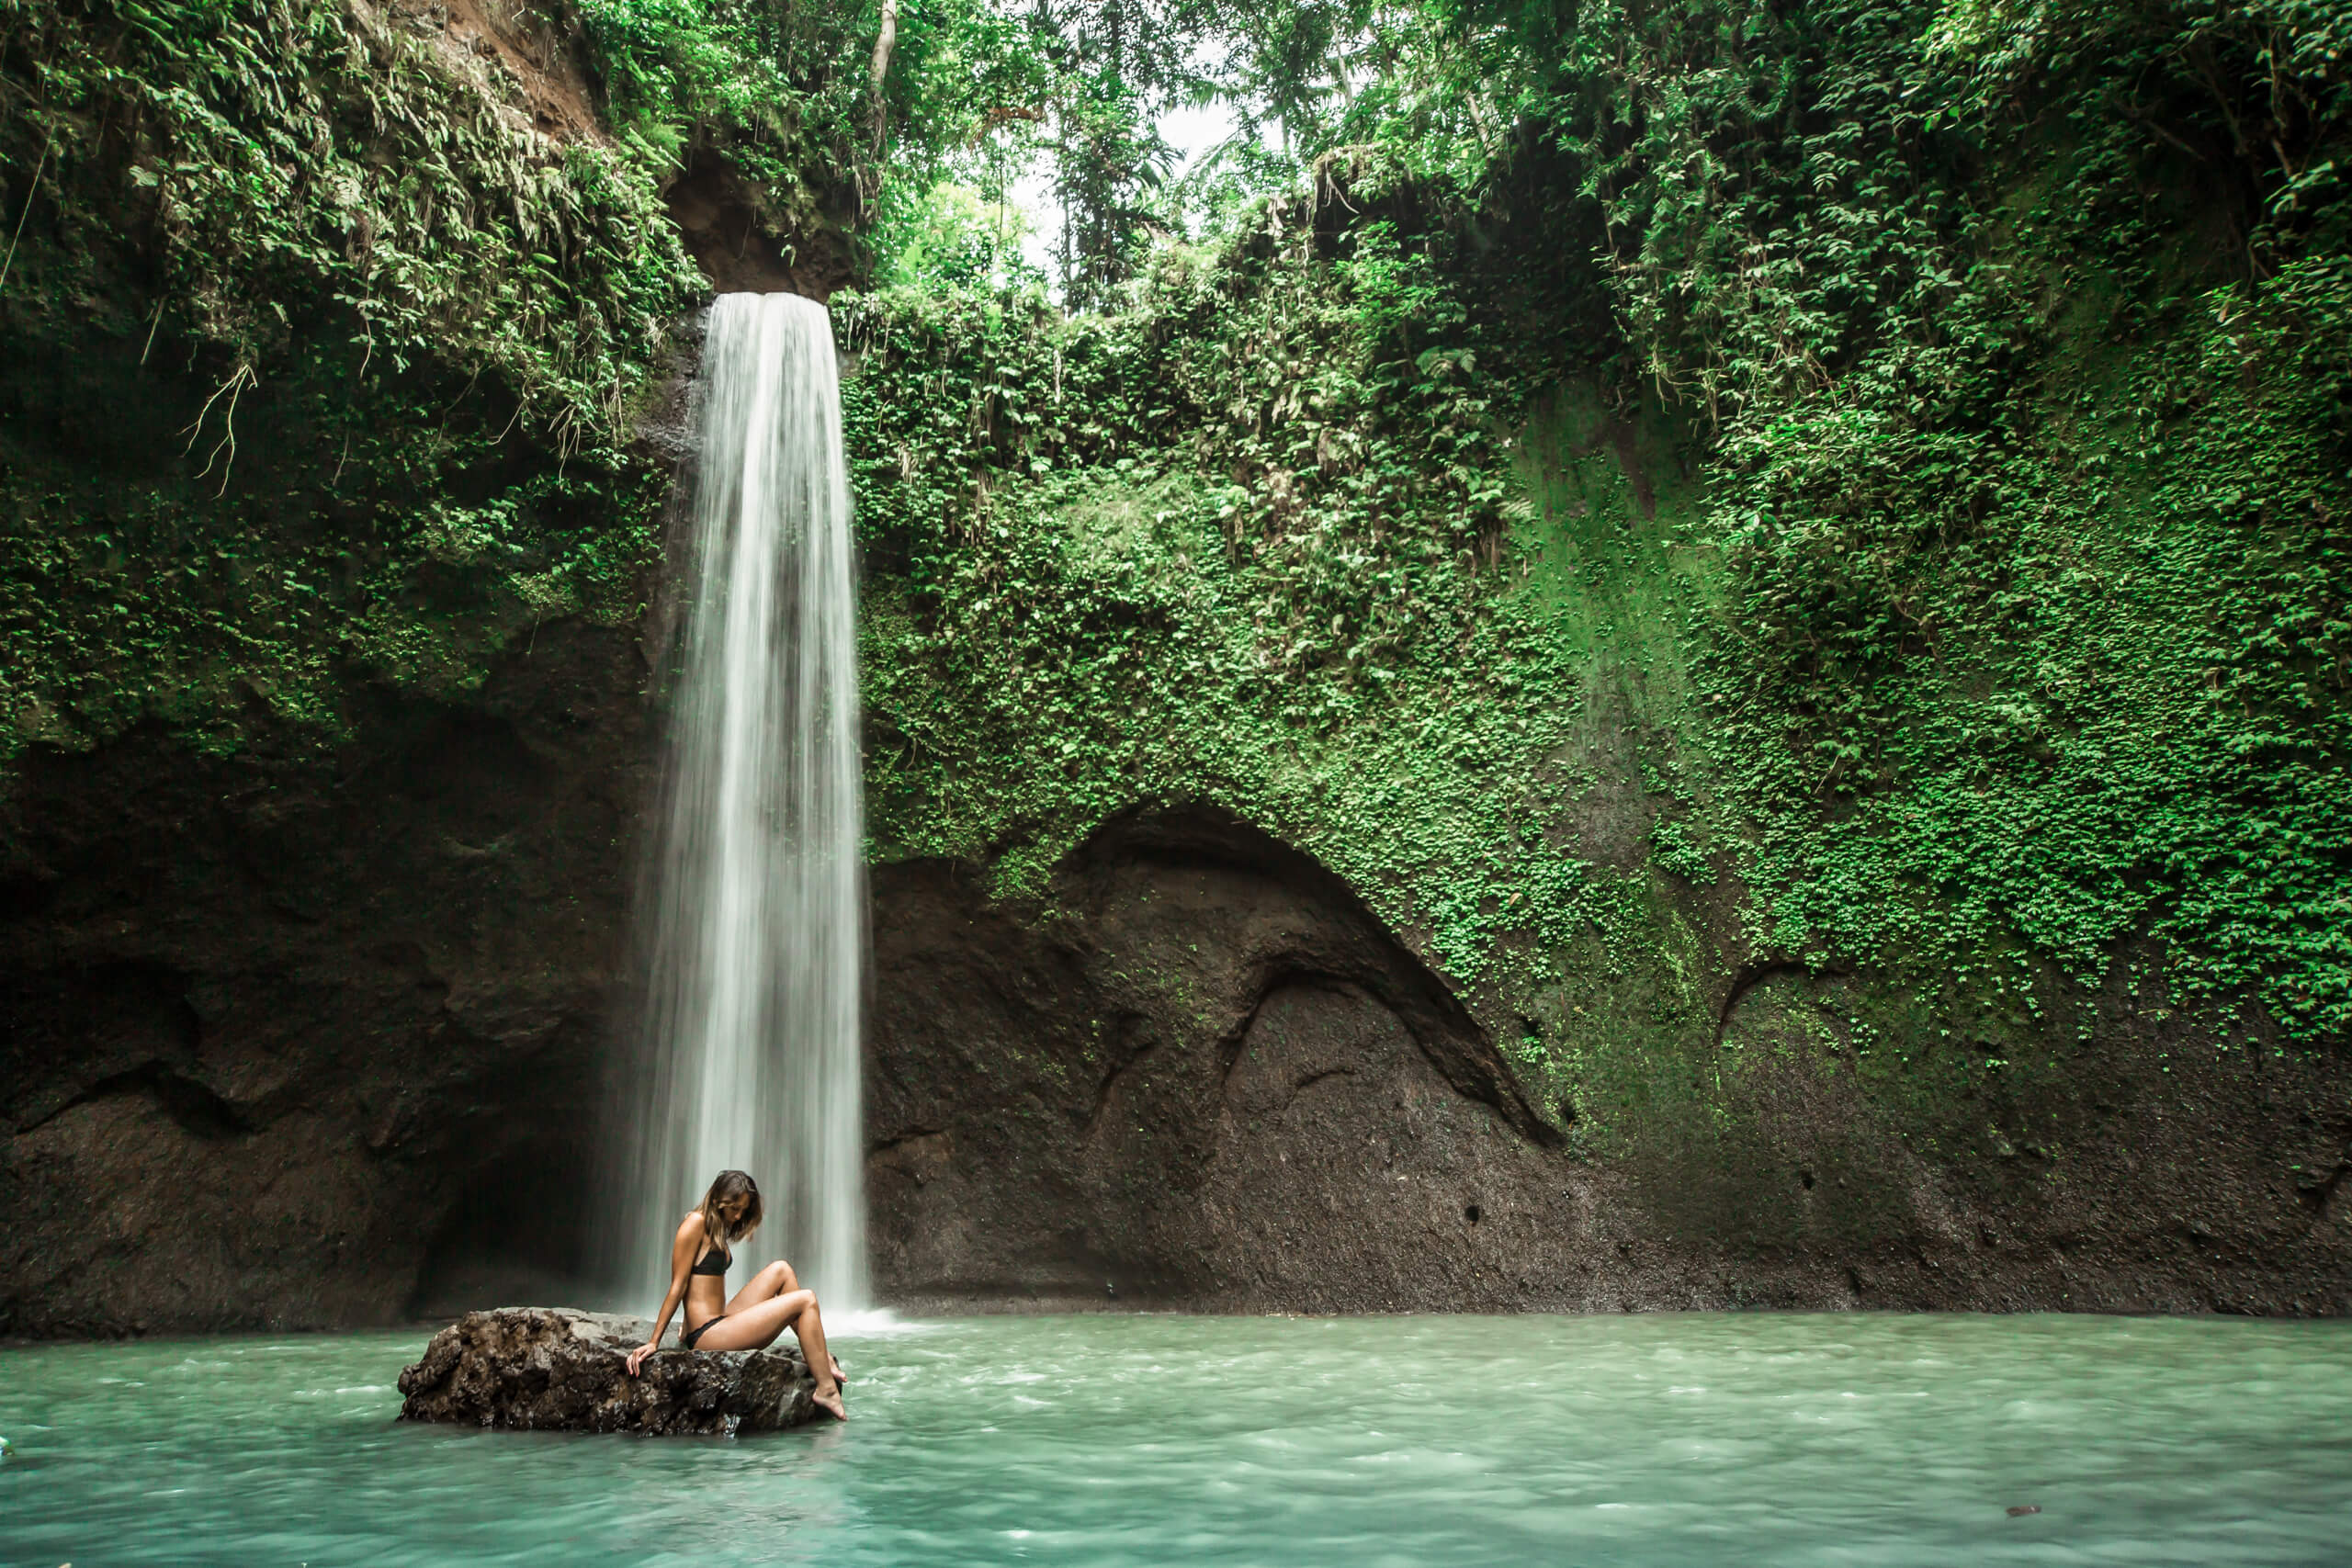 TIBUMANA WATERFALL | Paradise found… the perfect waterfall